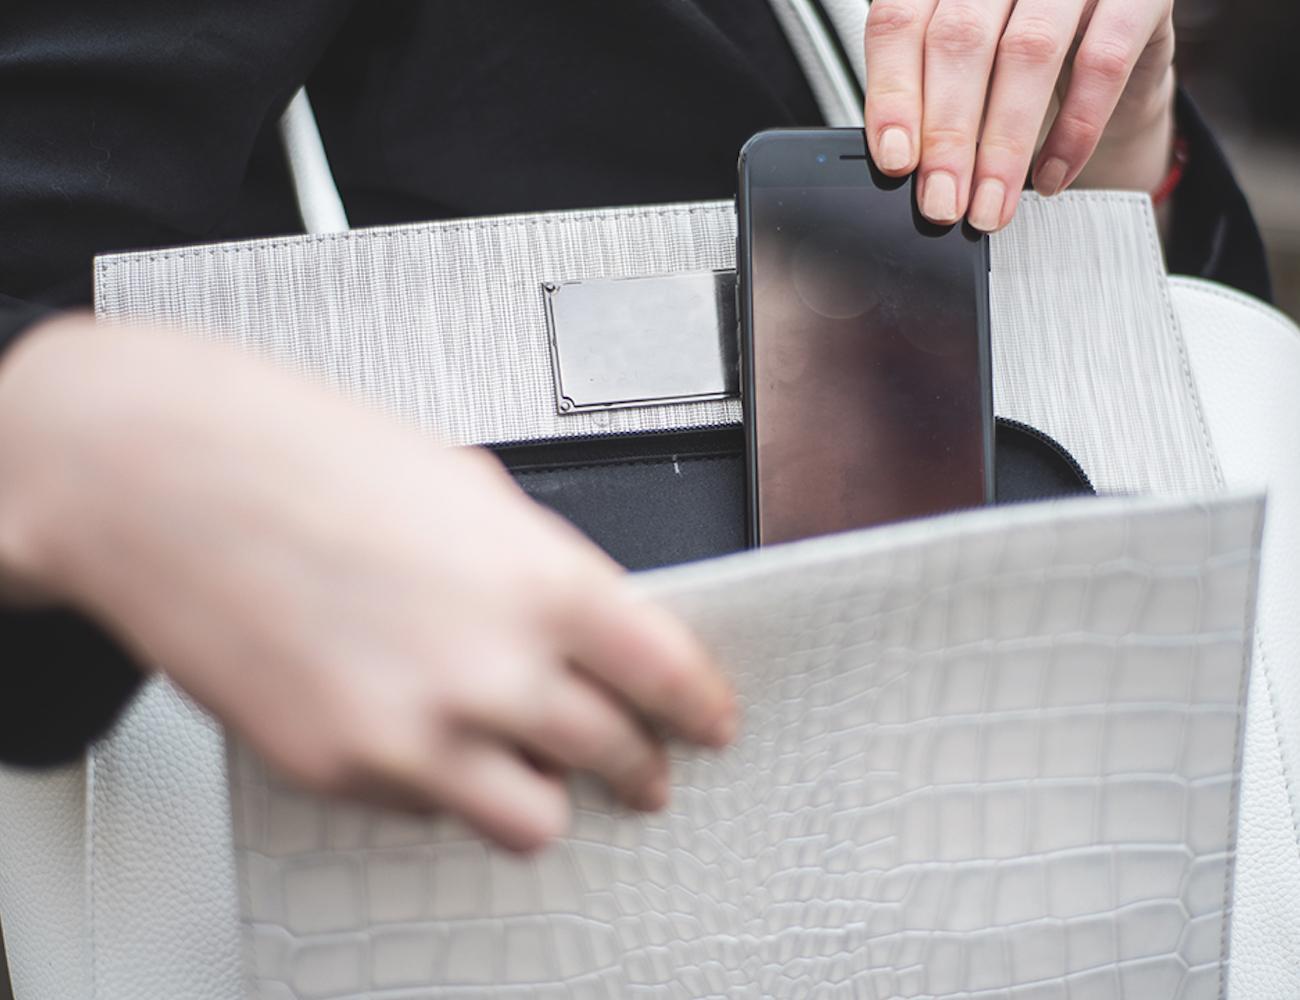 SMART Connected Luxury Handbag